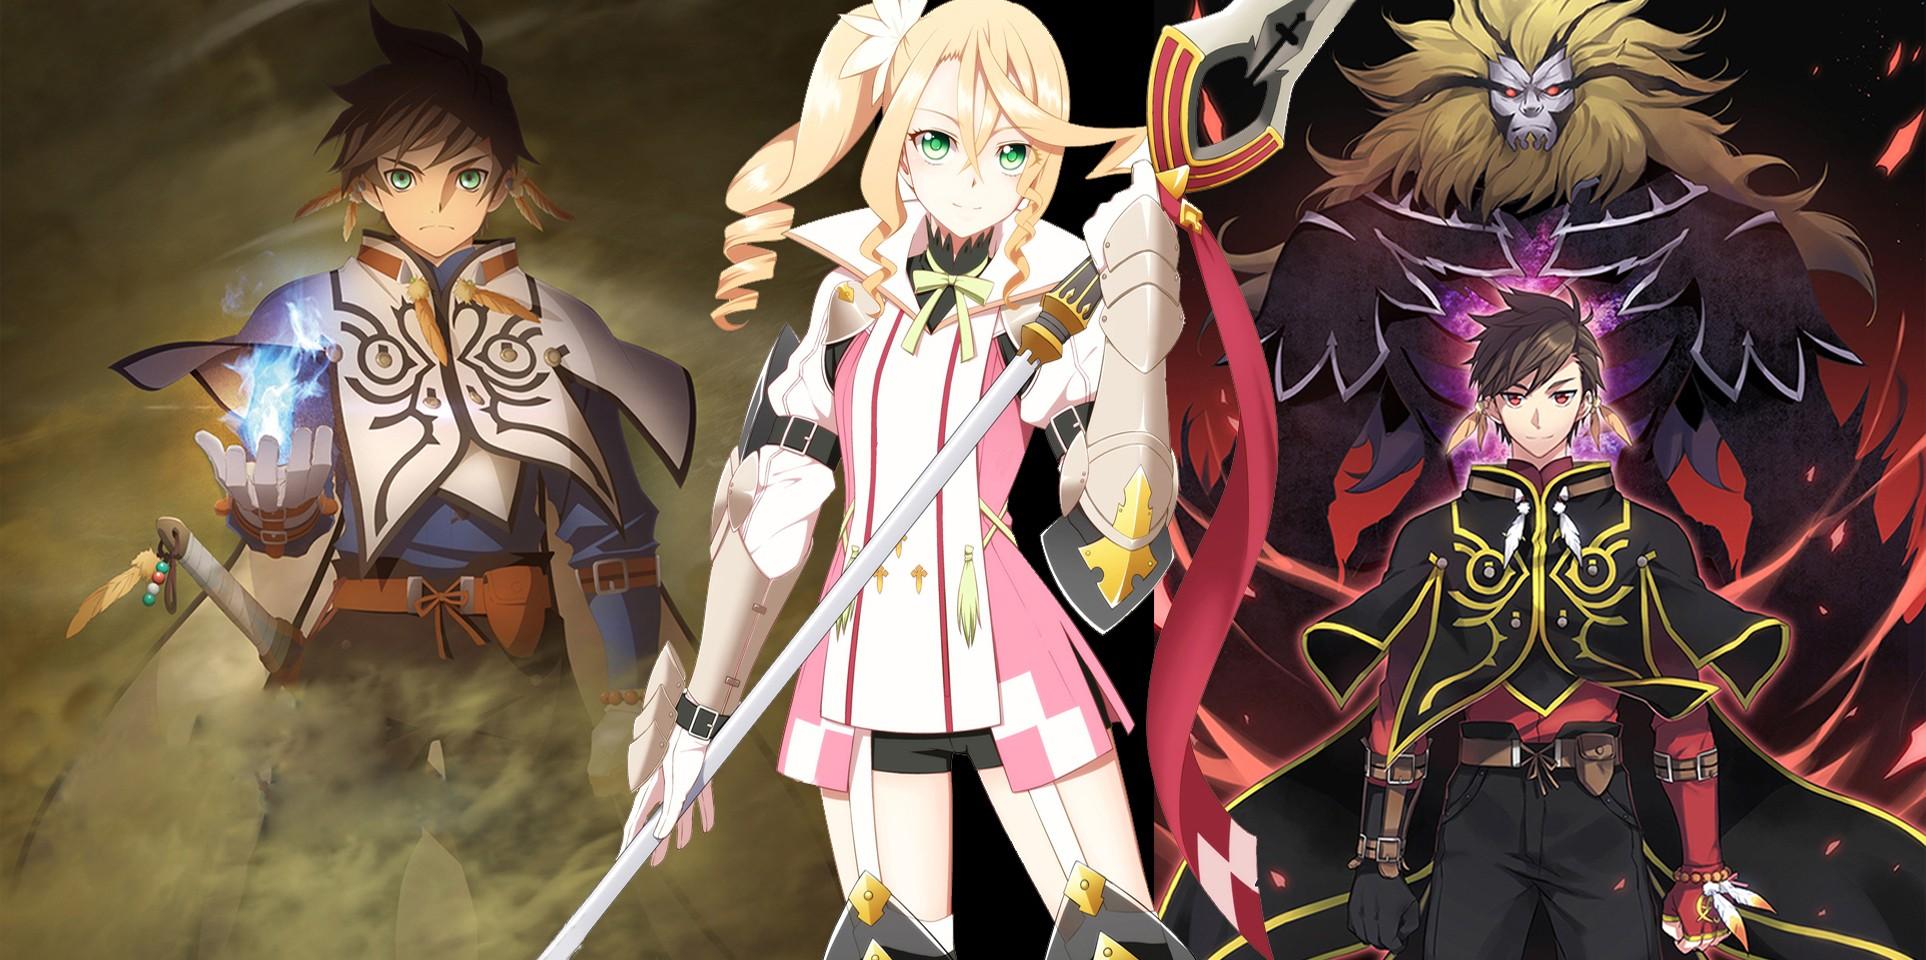 Wallpaper Anime Person Mythology Tales Of Zestiria Sorey